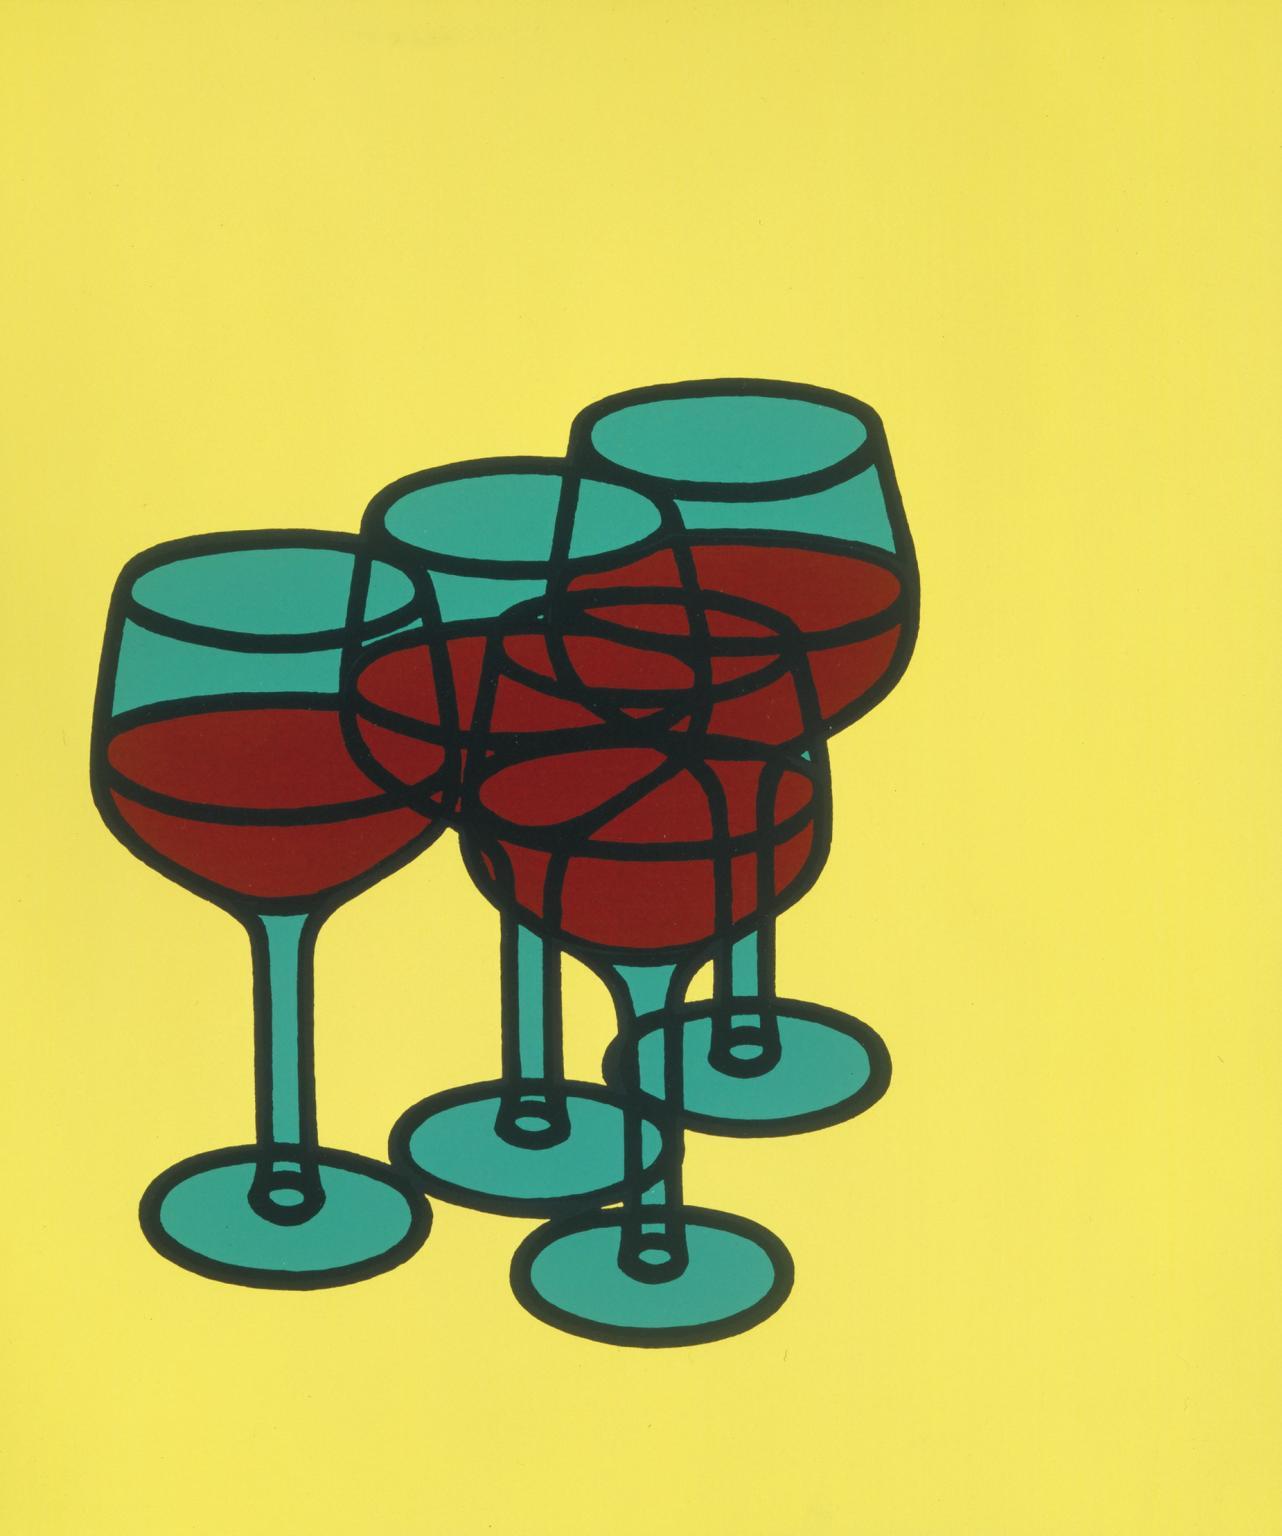 Wine Glasses, 1969 Image